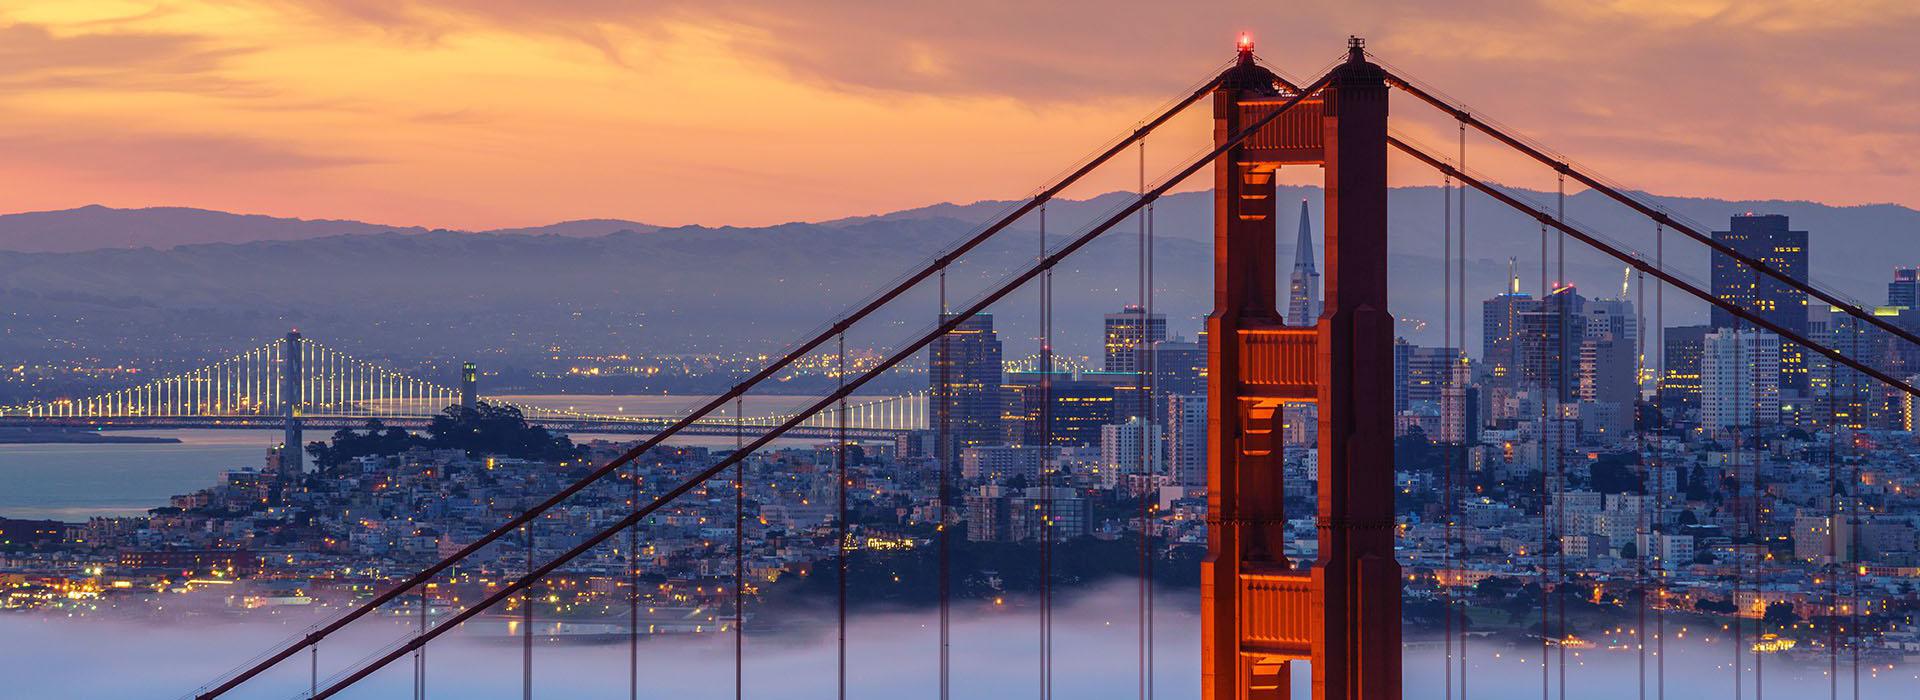 San Francisco_1920x700